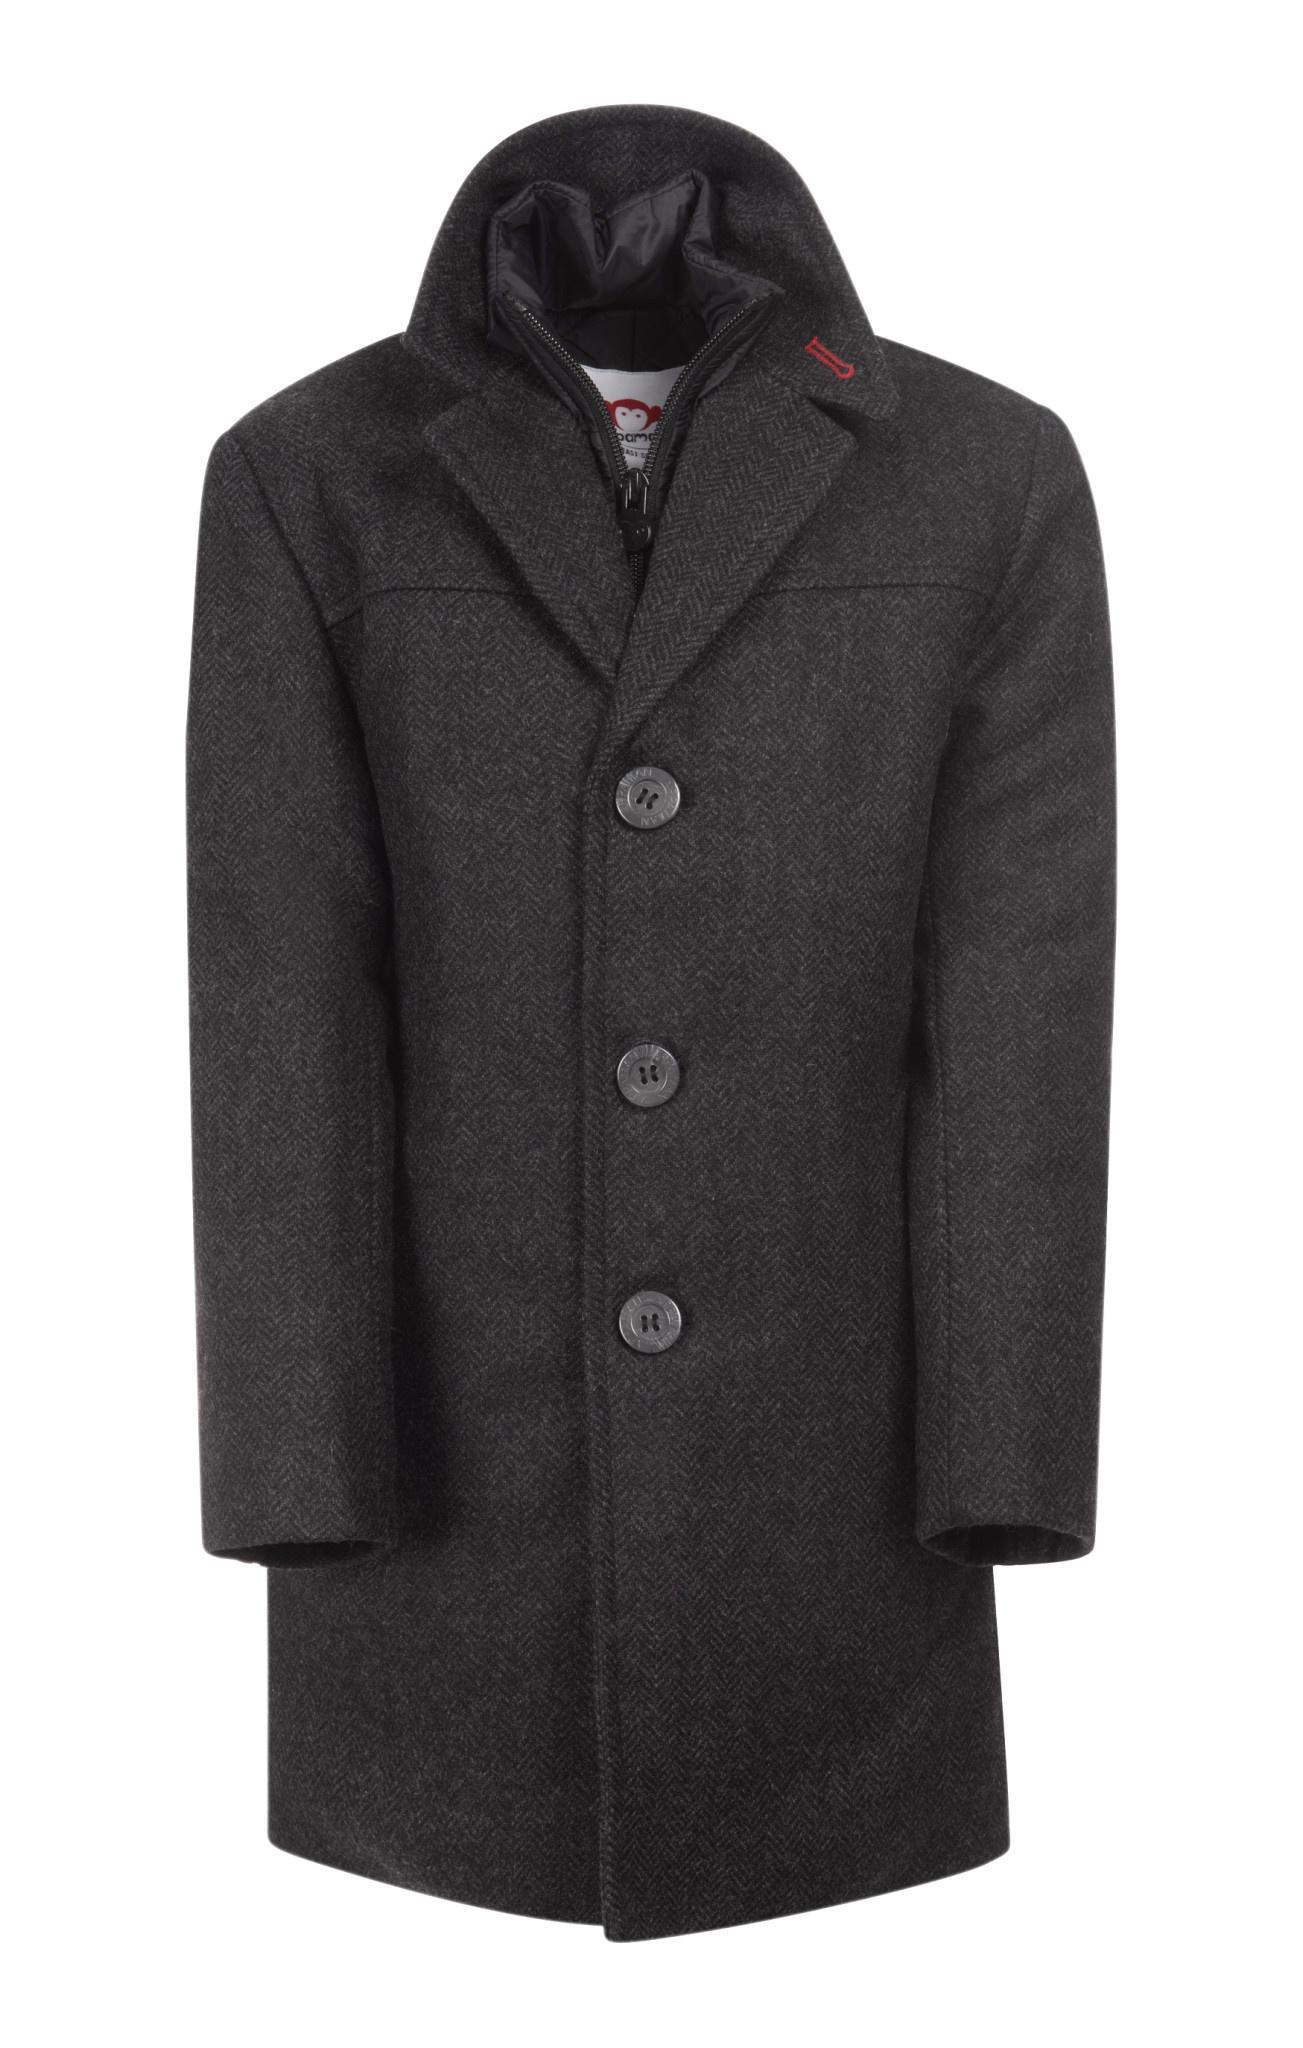 APPAMAN City Overcoat